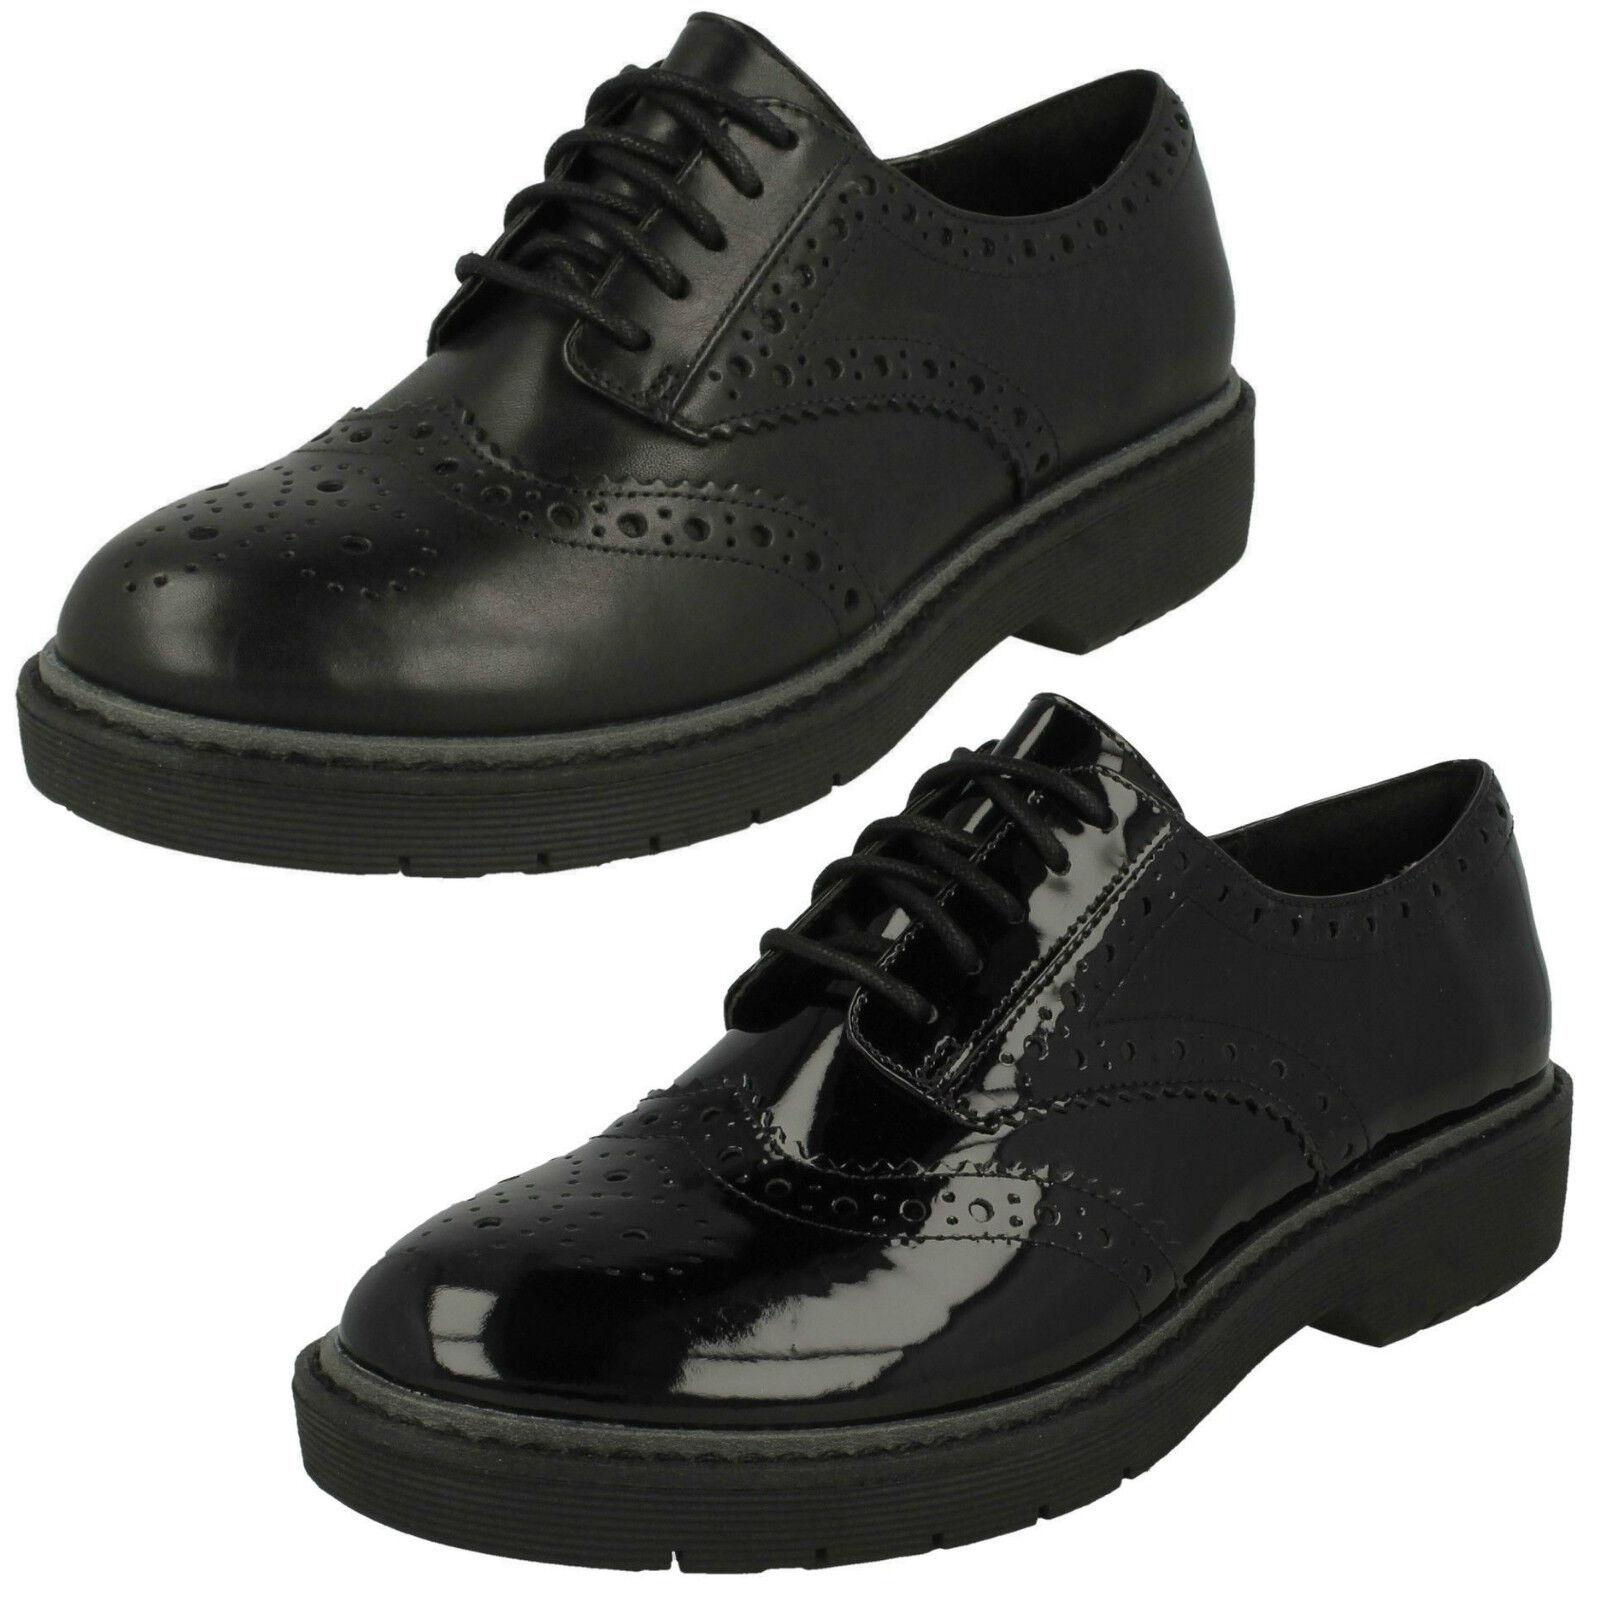 Mujer Clarks Alexa Darcy Cuero Negro o Charol Grueso Grueso Grueso Zapatos Oxford con Cordones  perfecto